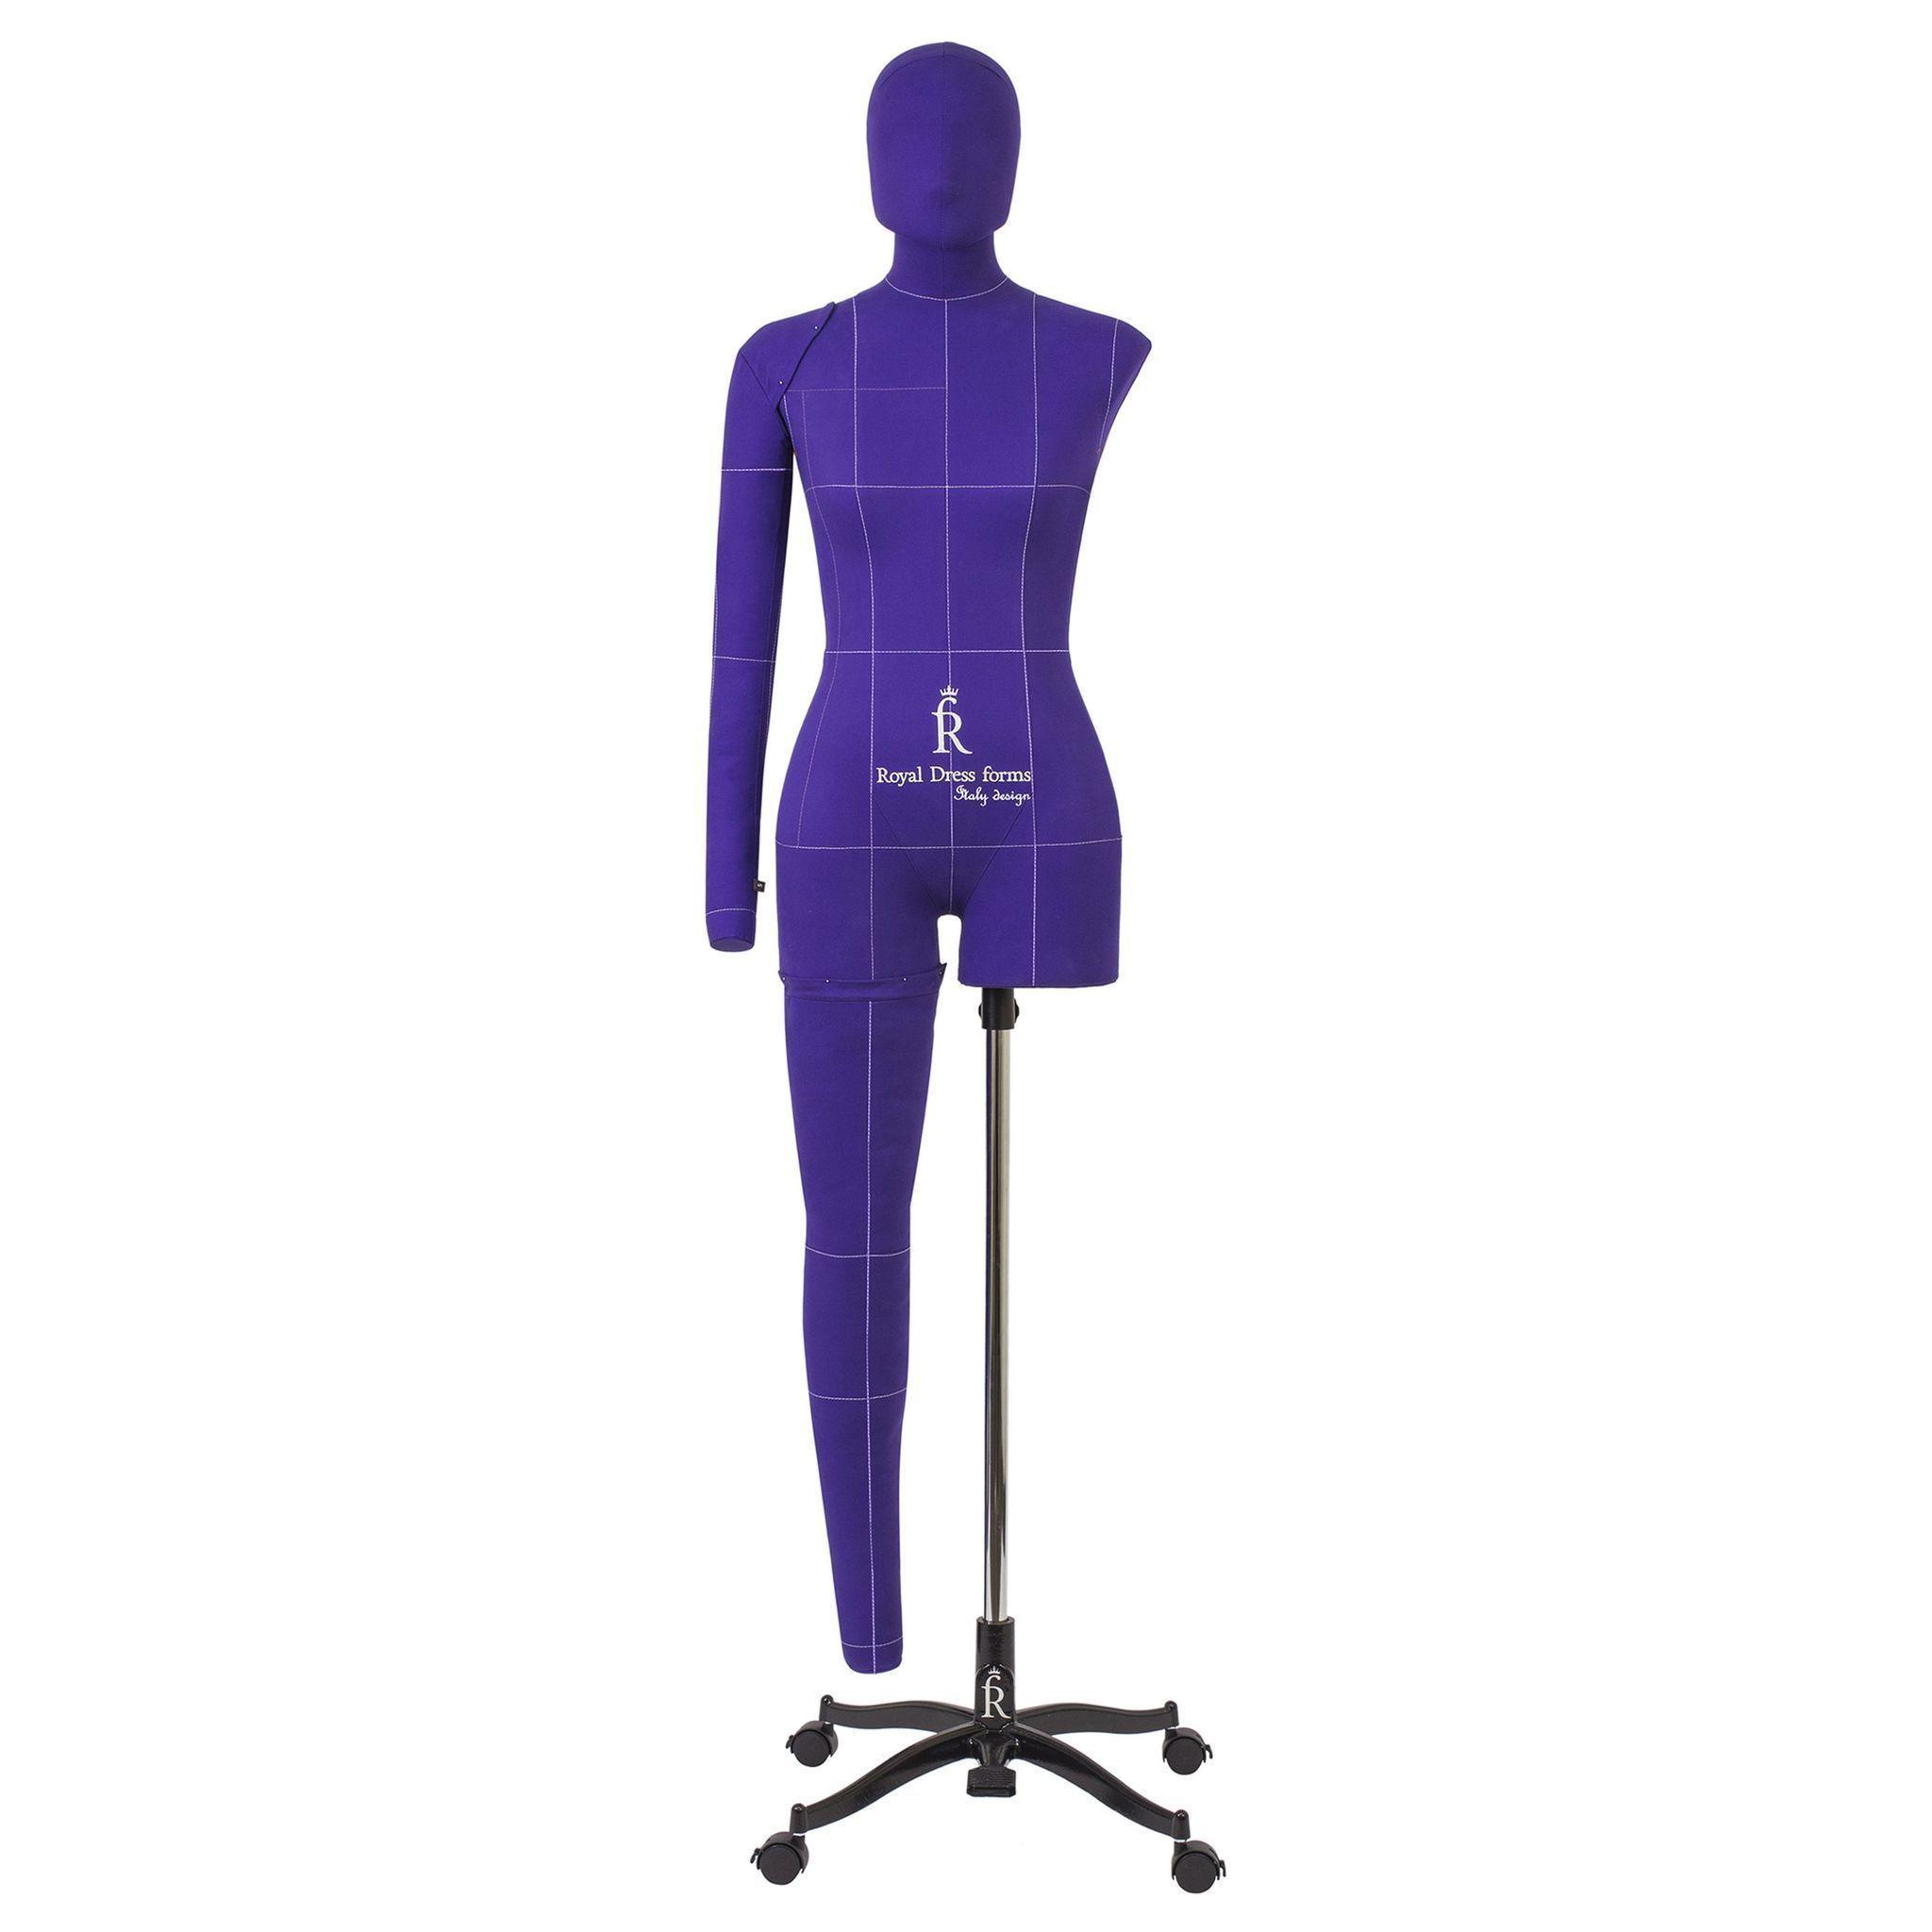 Манекен портновский Моника, комплект Арт, размер 54, ФиолетовыйФото 3